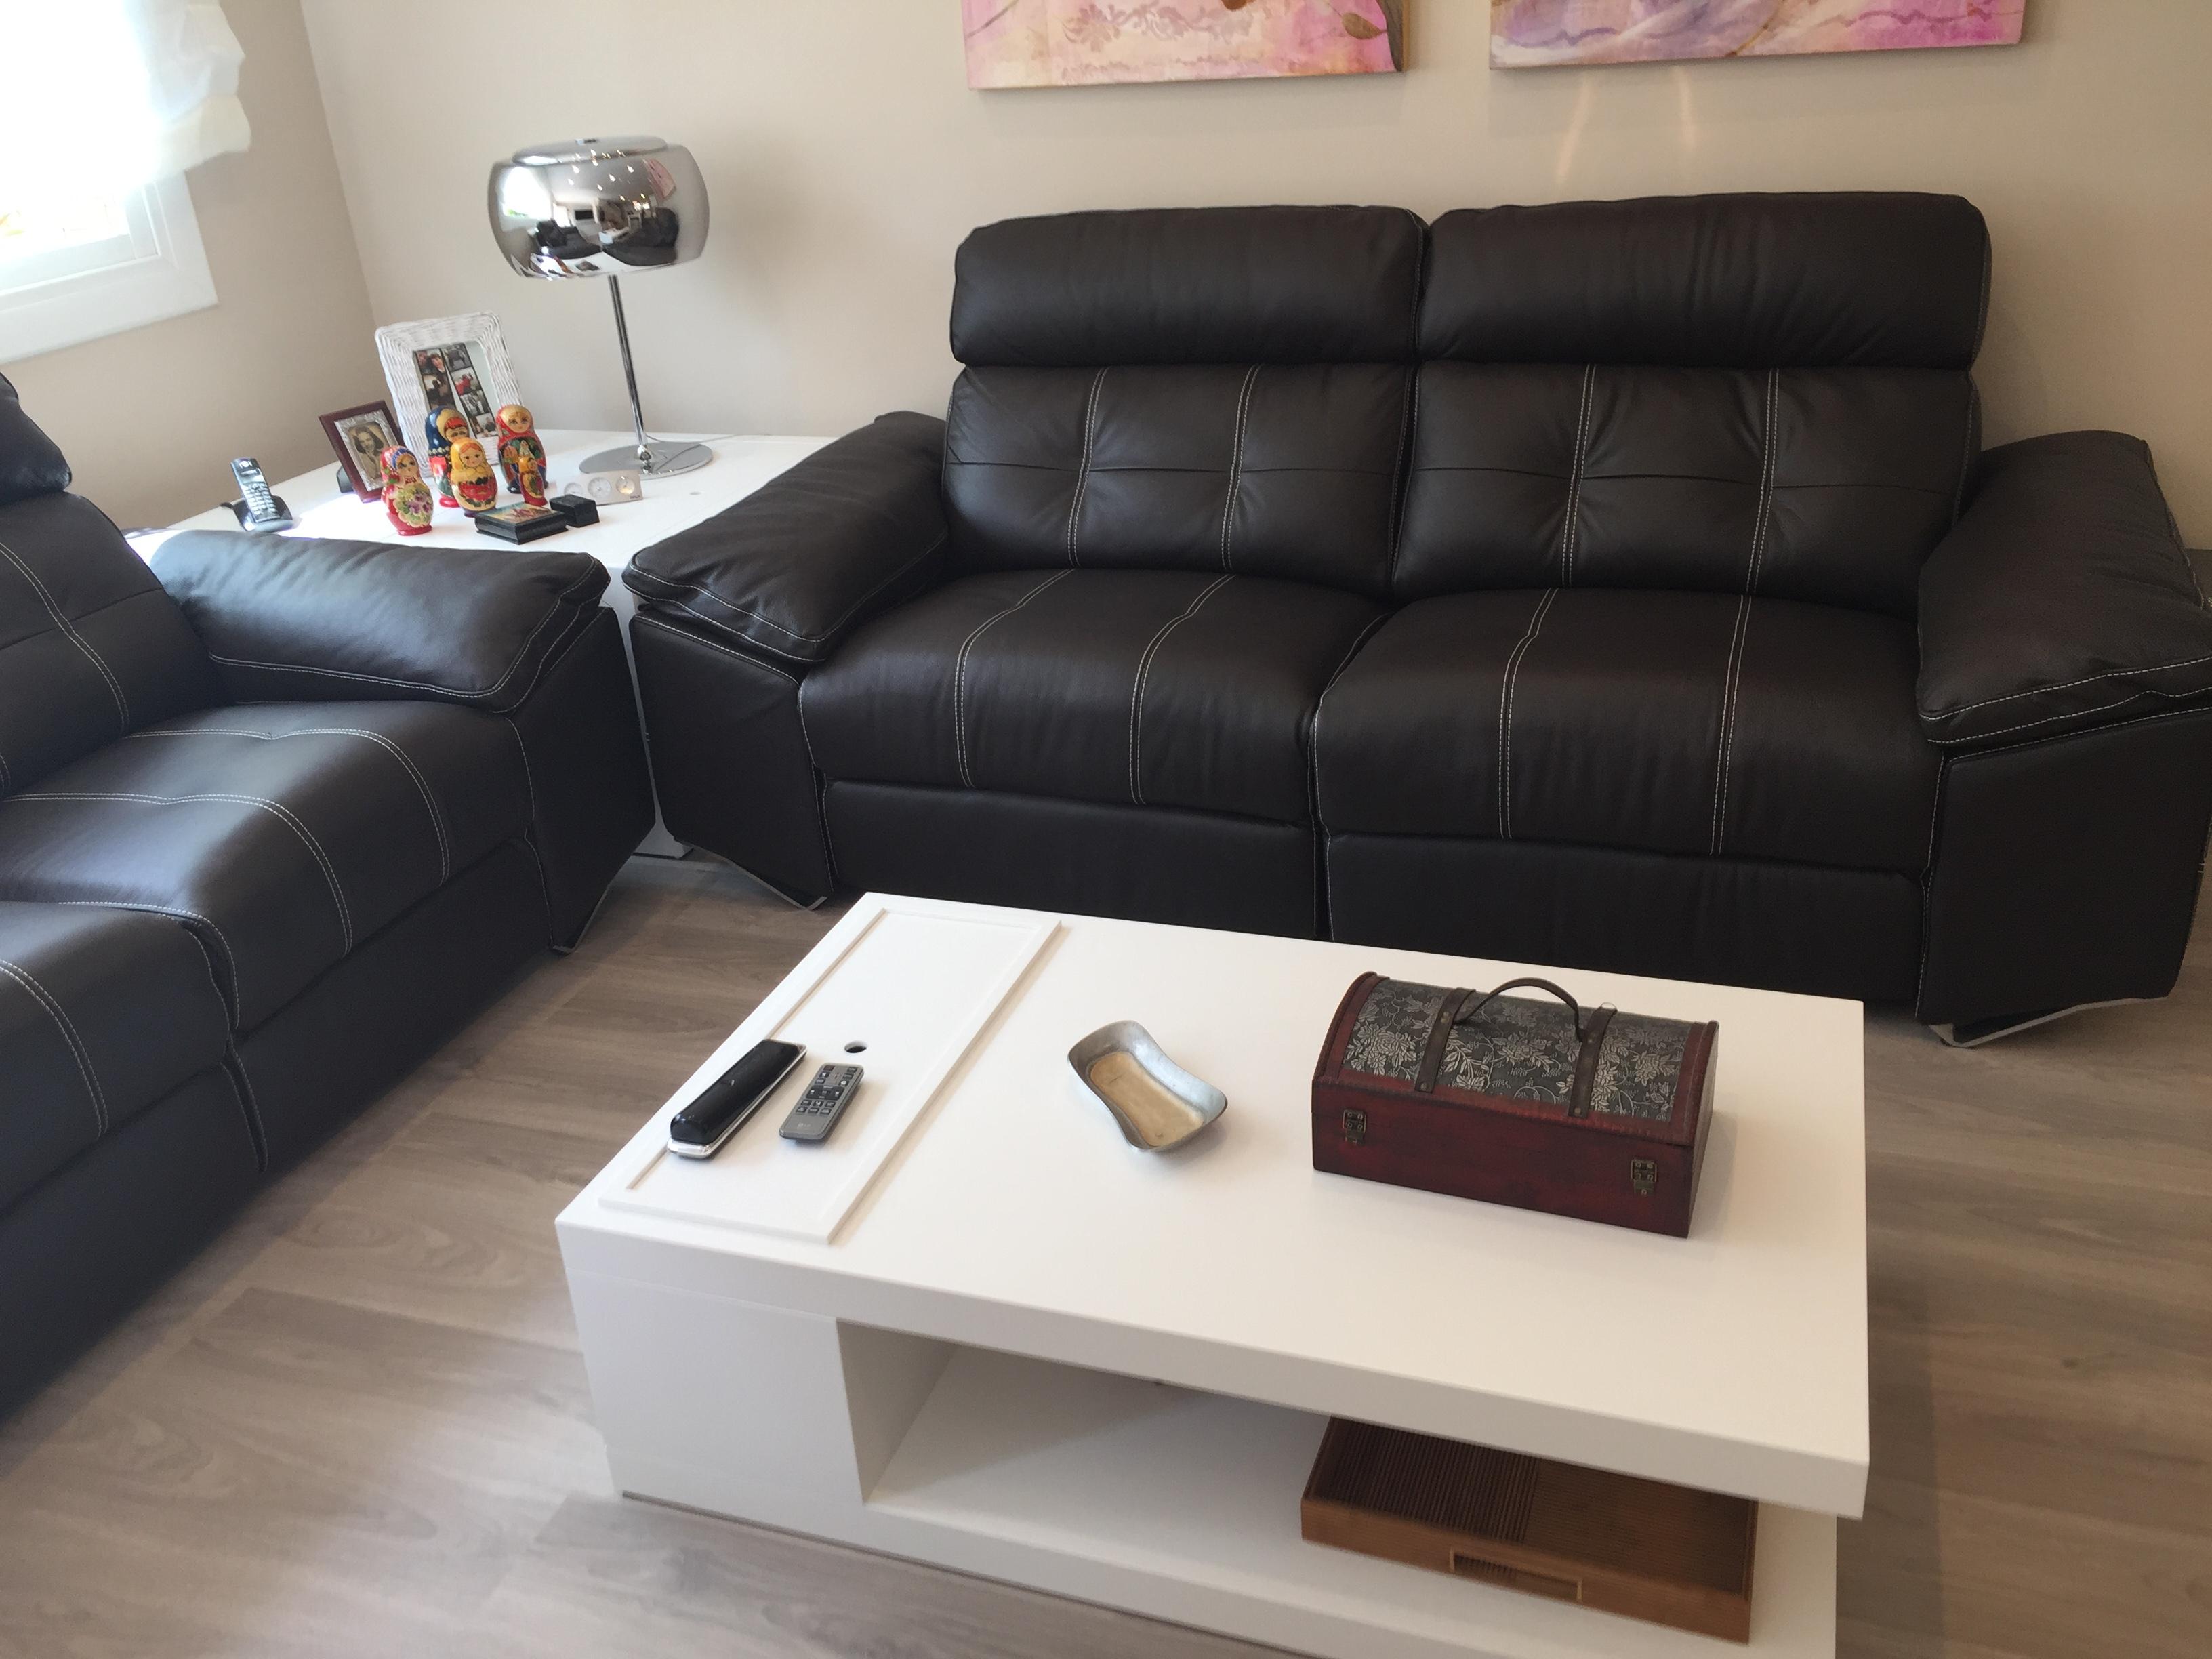 Decoraci llavaneres muebles almazan - Muebles en almazan ...